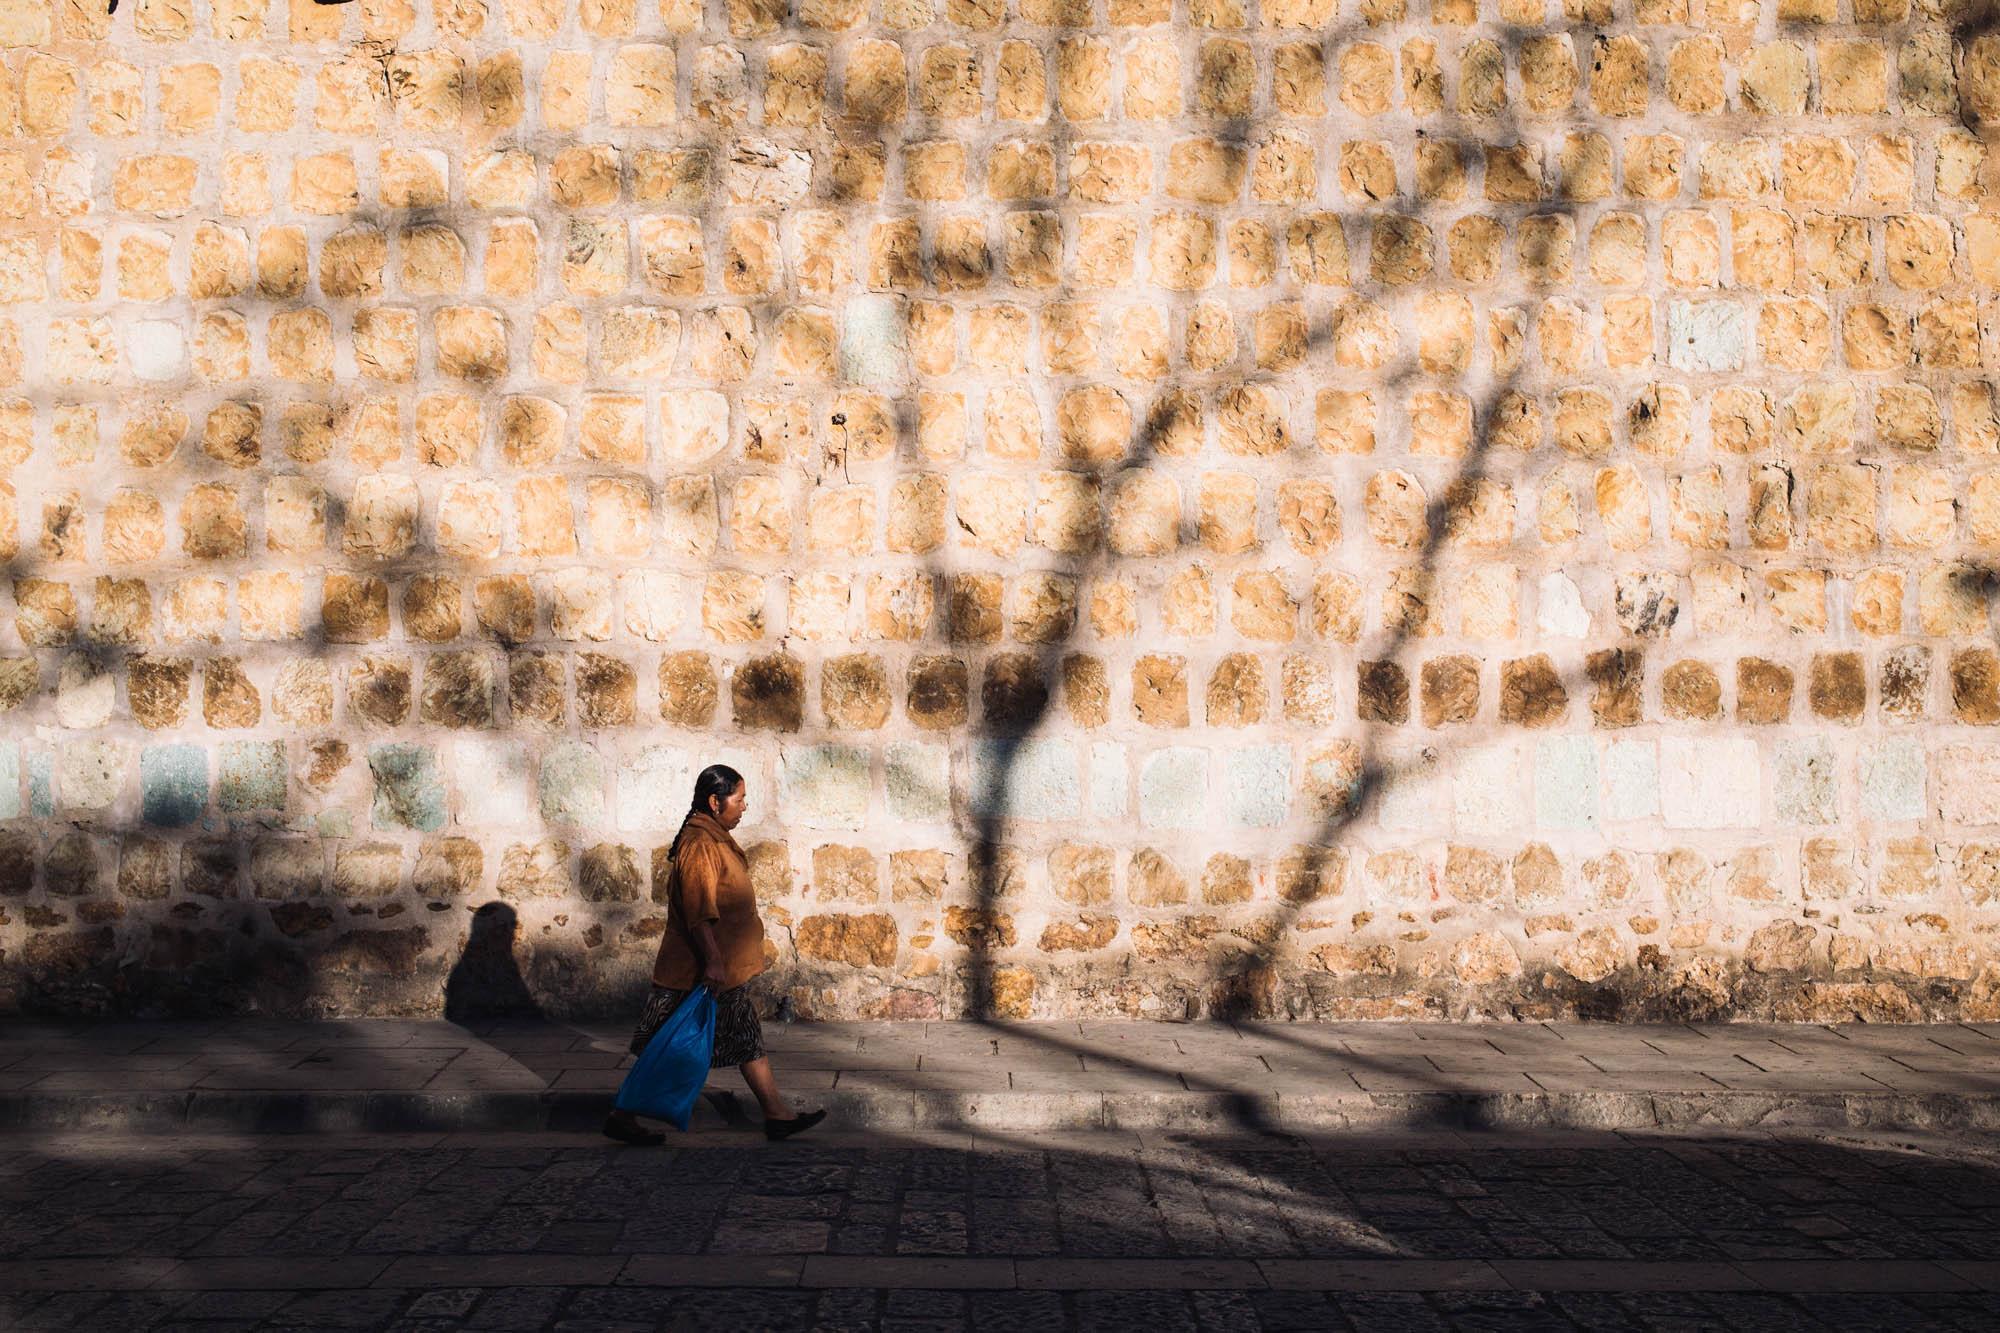 calle alcala by Ren Fuller